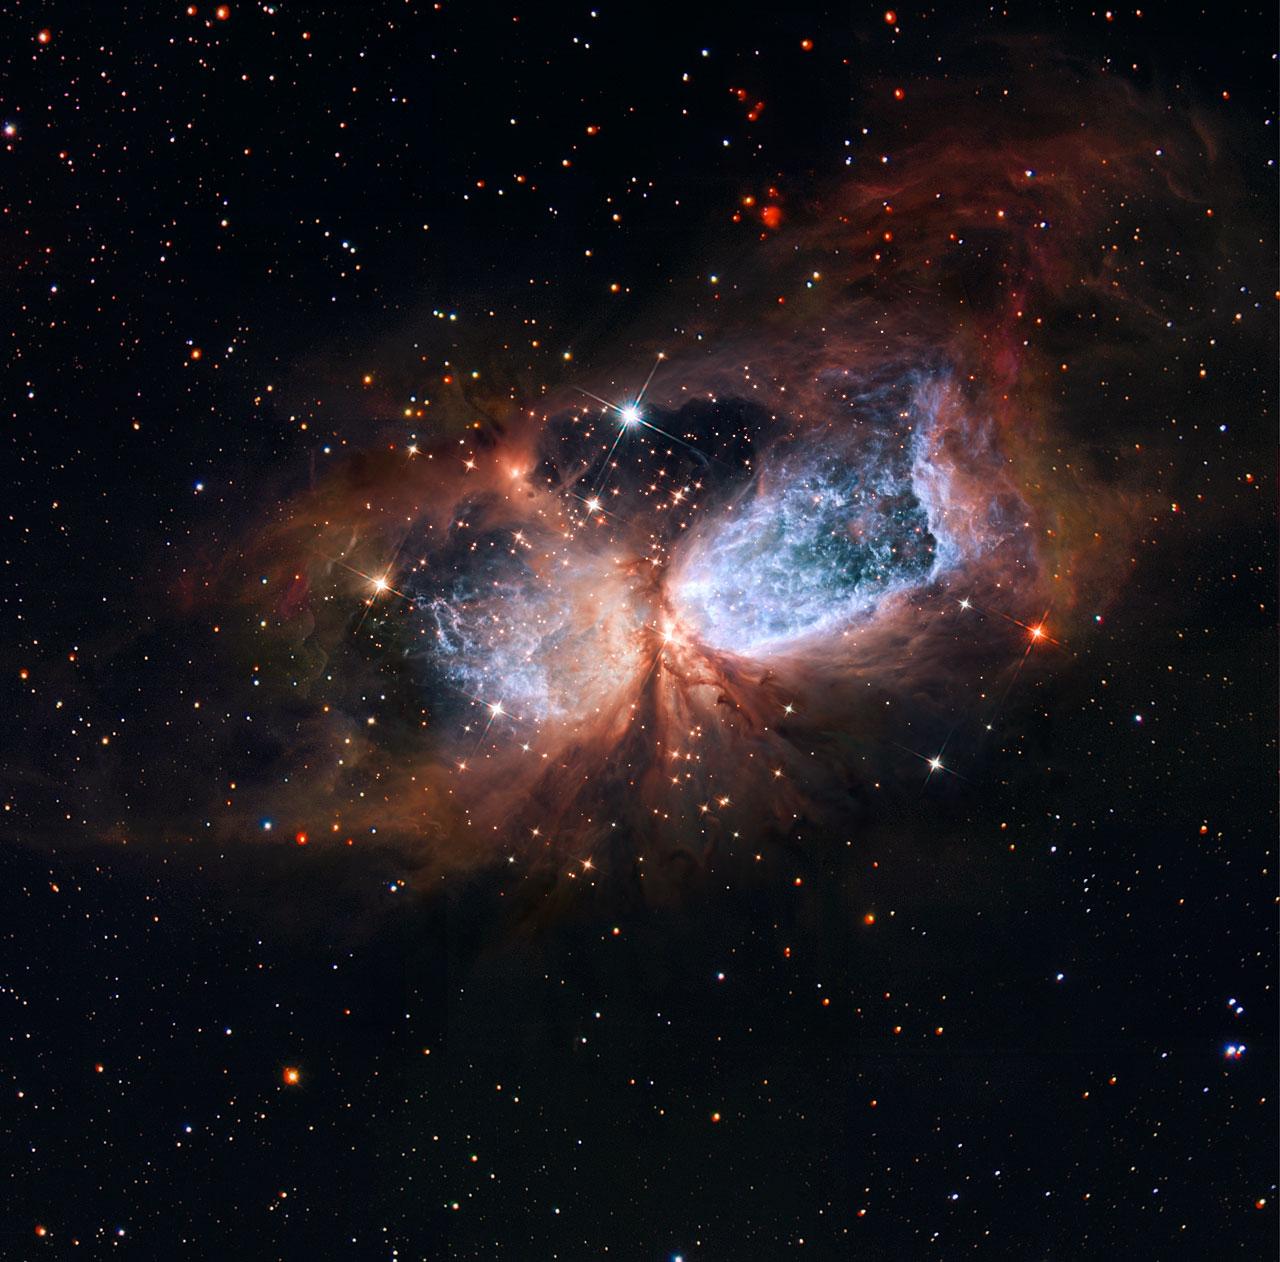 Hubble/Subaru composite of star-forming region S 106